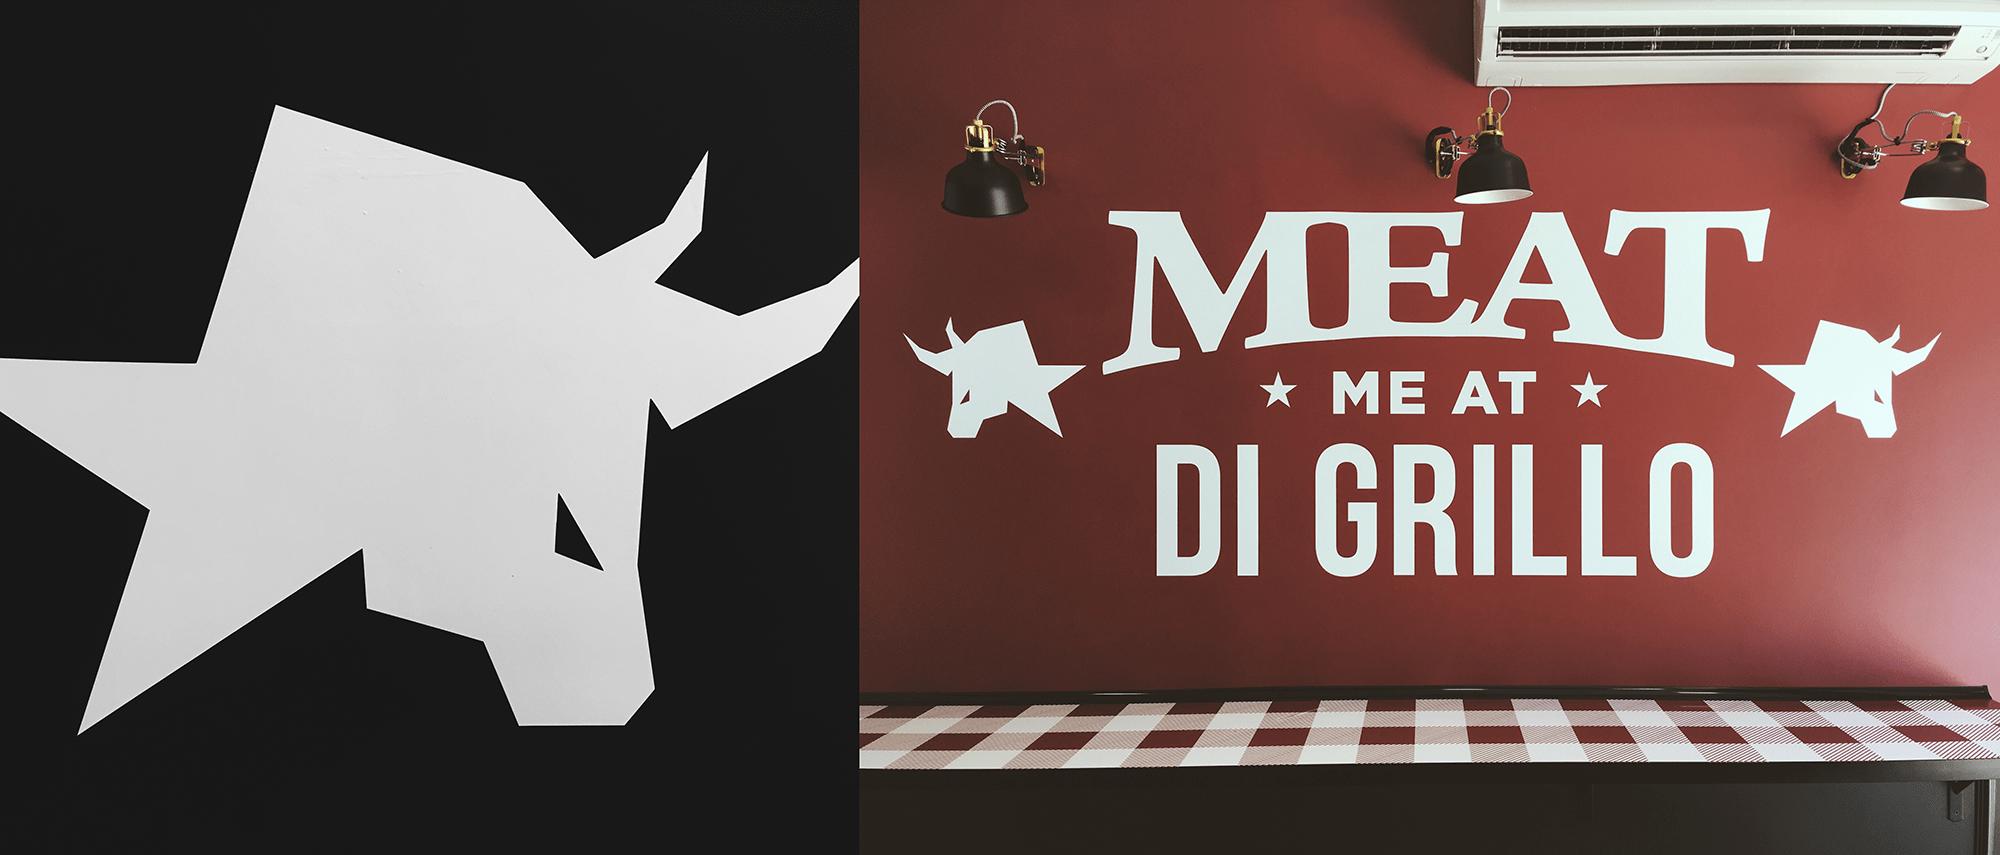 branding logo menus design сандвич бар лого дизайн брандинг от Muse Creativity рекламна агенция студио за дизайн и реклама 2